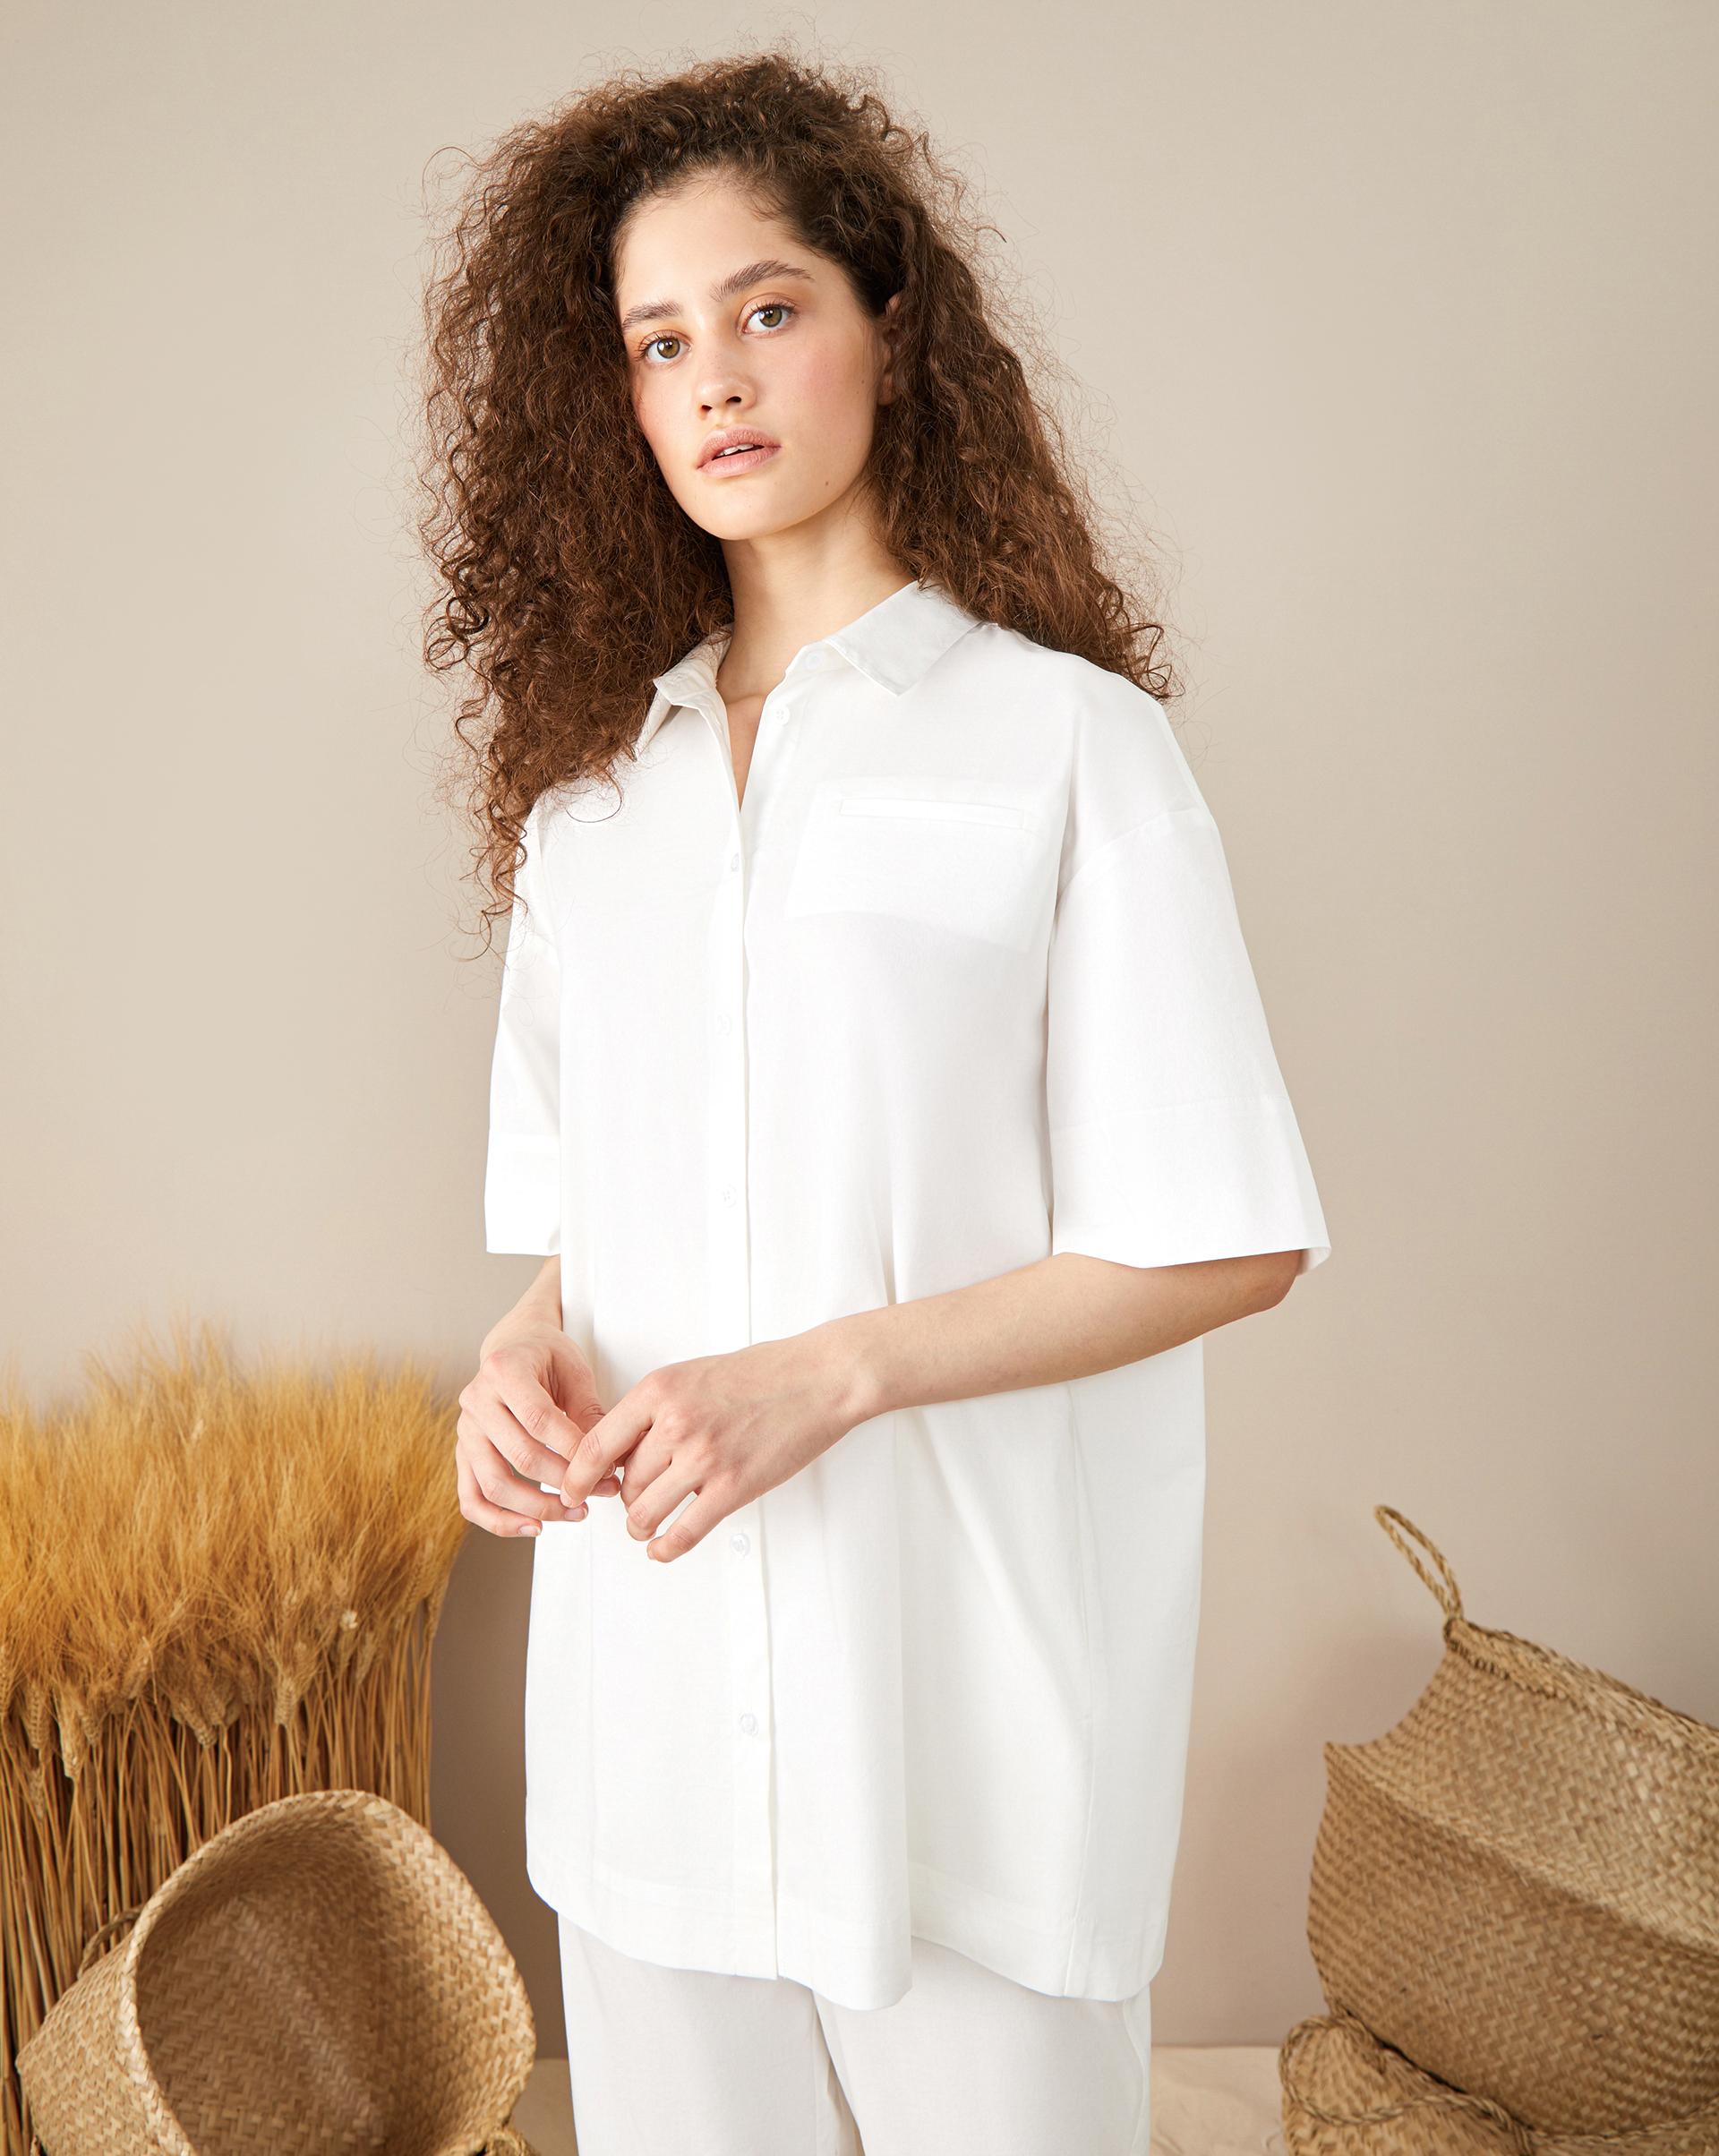 12Storeez Блуза с коротким рукавом блуза с коротким рукавом seventy блузы с коротким рукавом